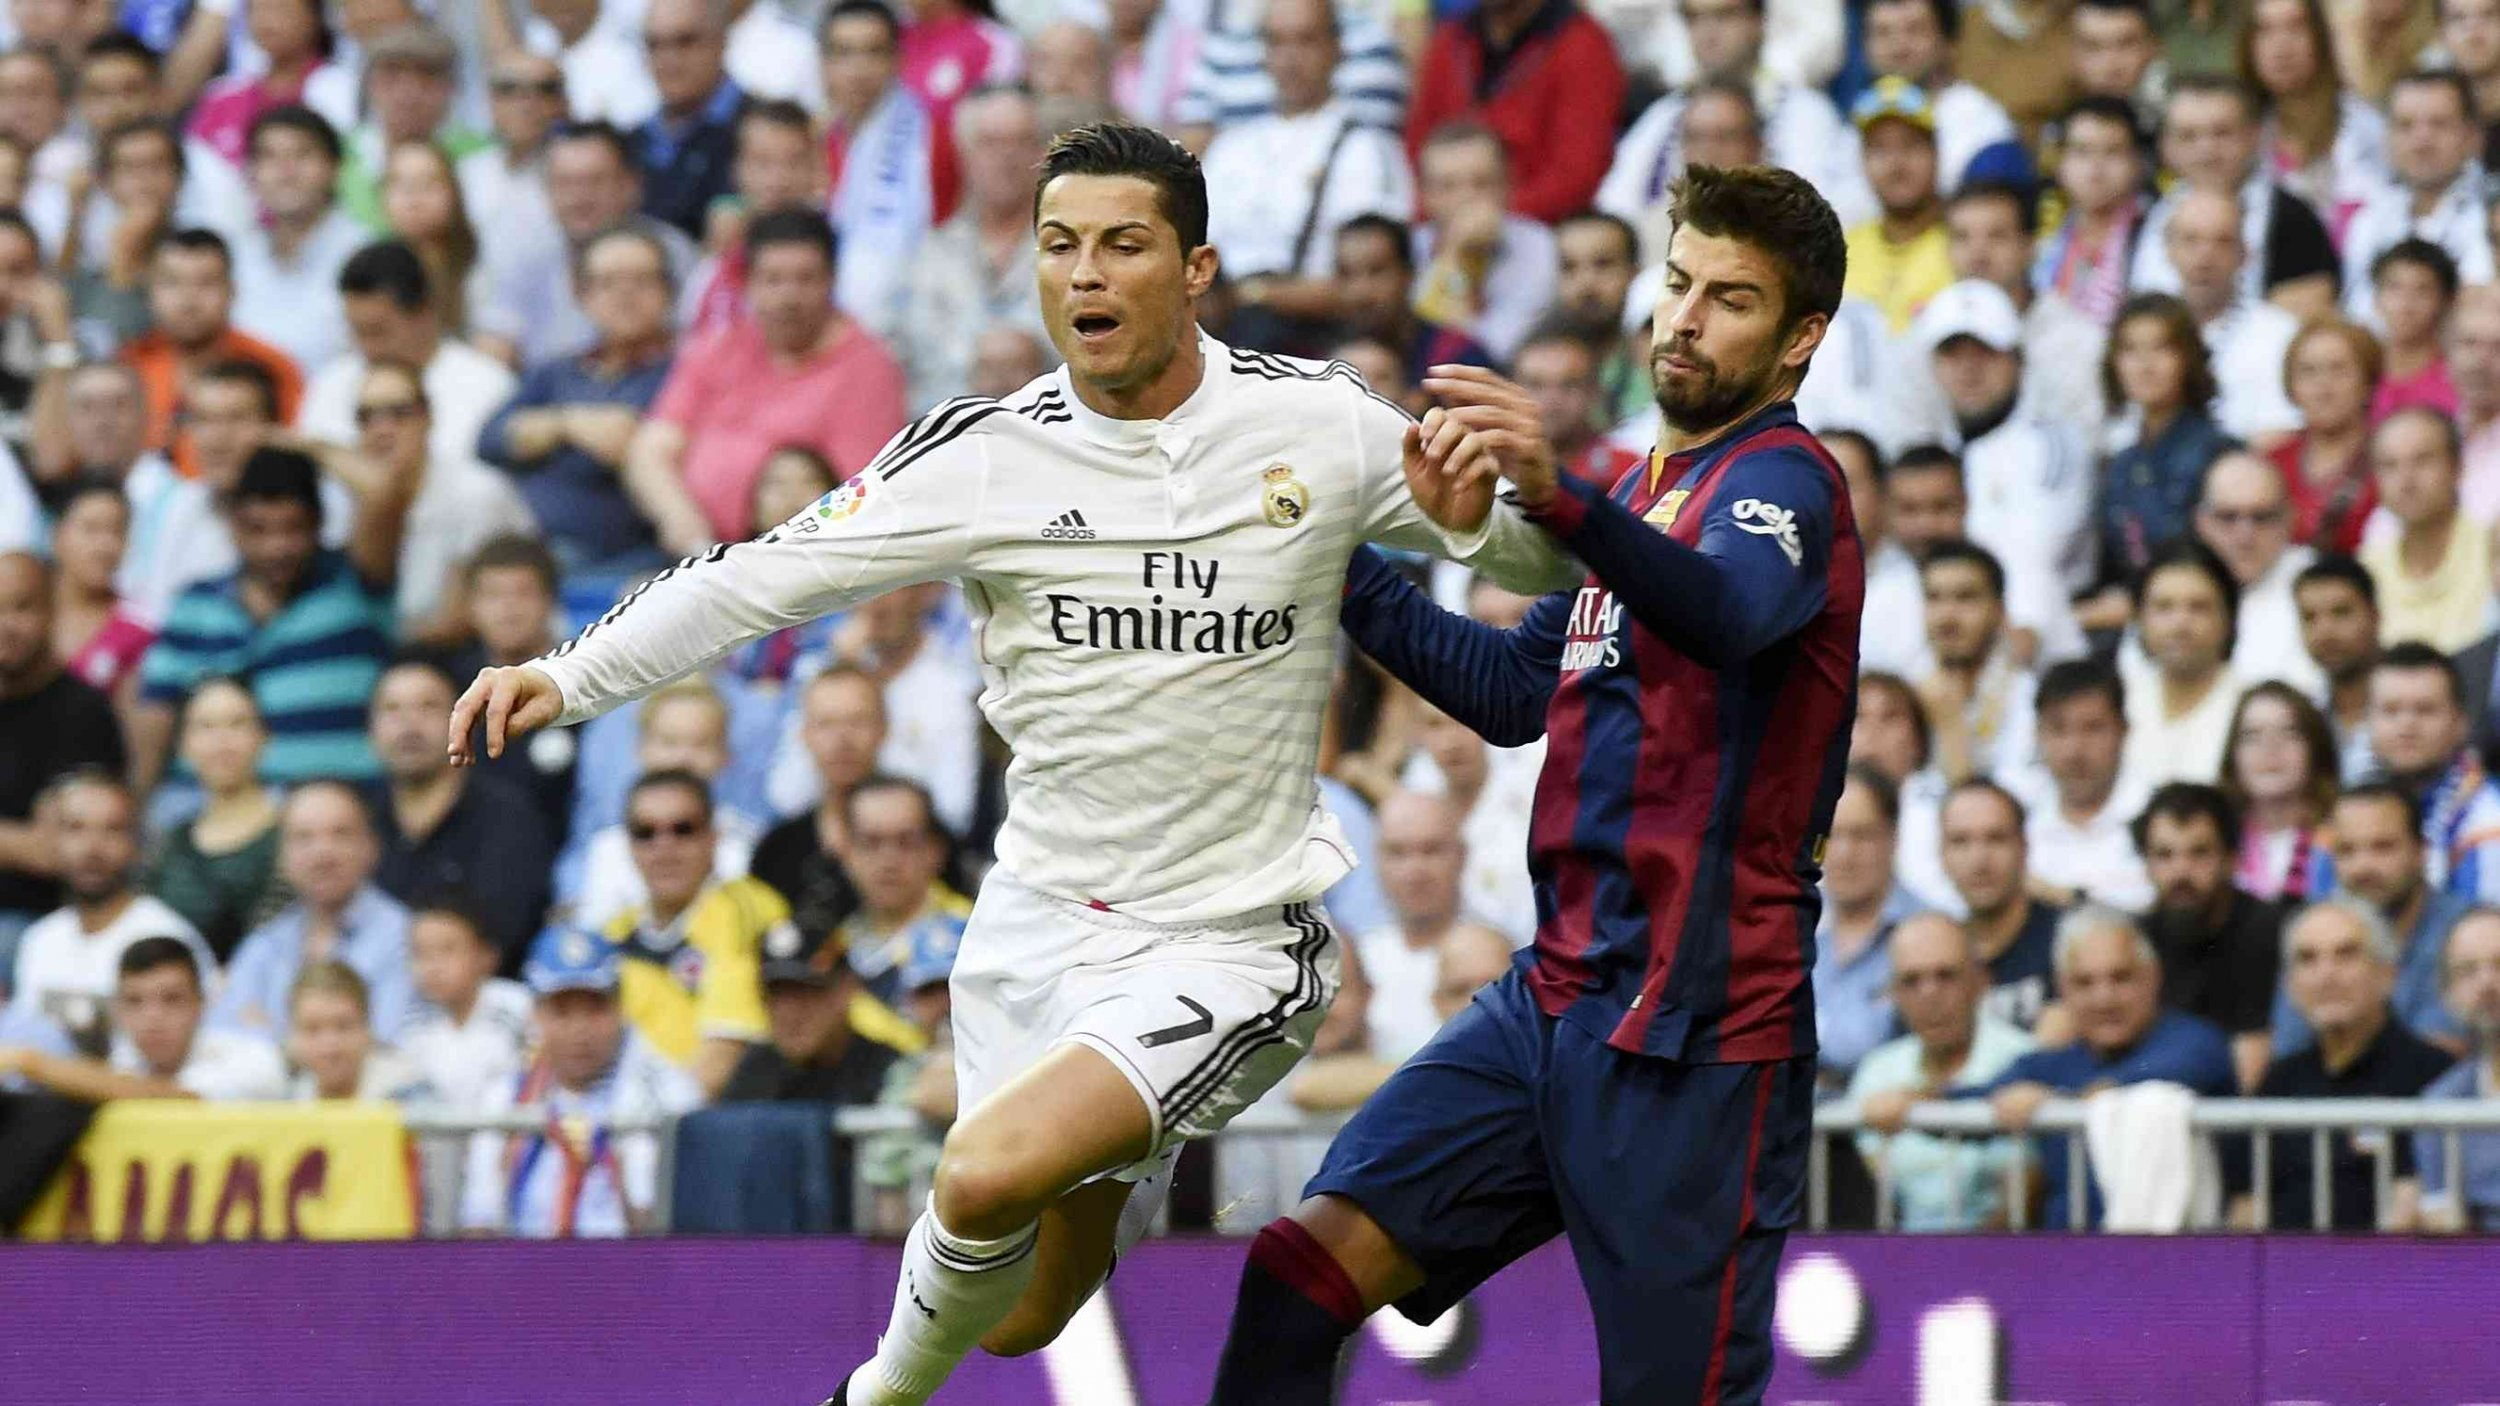 real_madrid_vs_barcelona_real_madrid_barcelona_fc_barcelona_gerard_pique_cristiano_ronaldo_101050_2560x1440.jpg